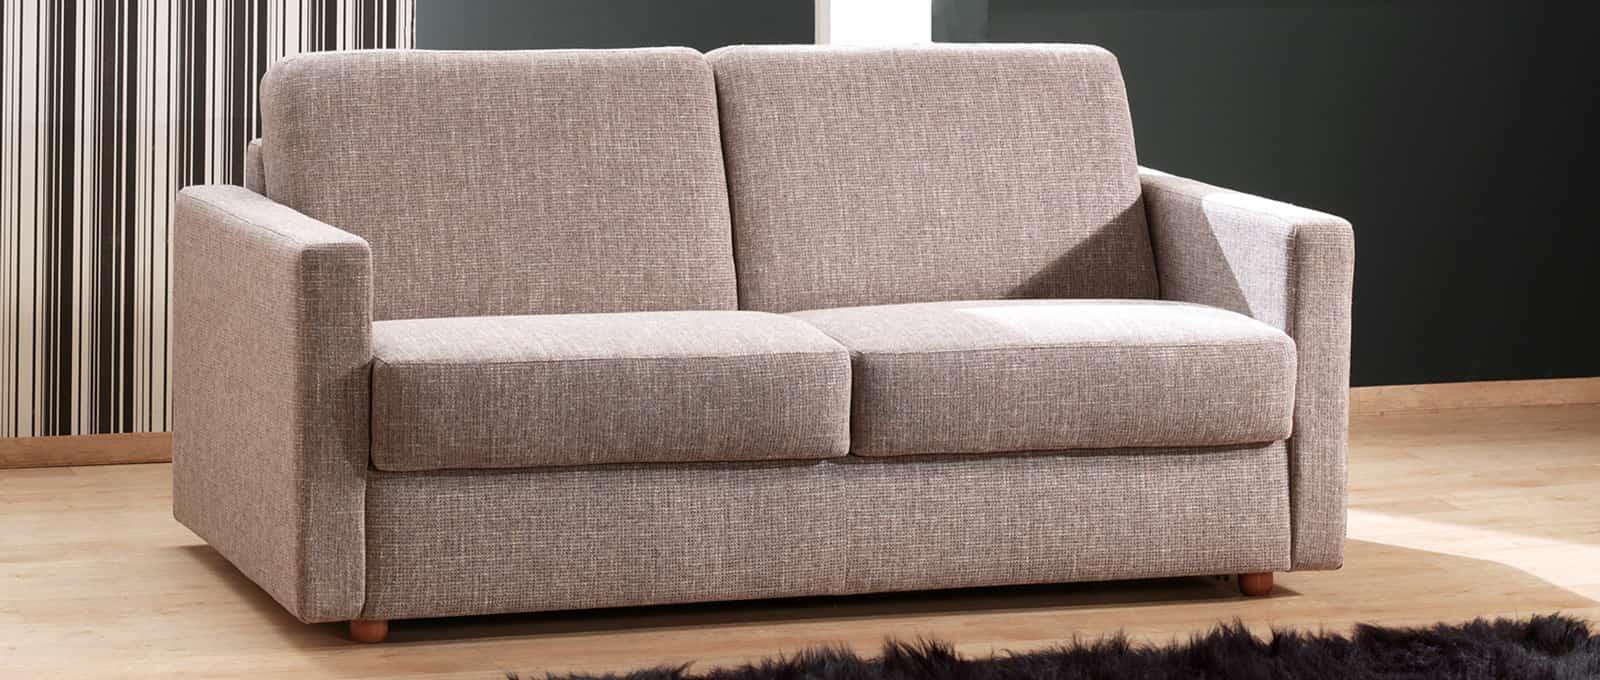 schlafsofa arizona amigo zum g nstigen preis. Black Bedroom Furniture Sets. Home Design Ideas